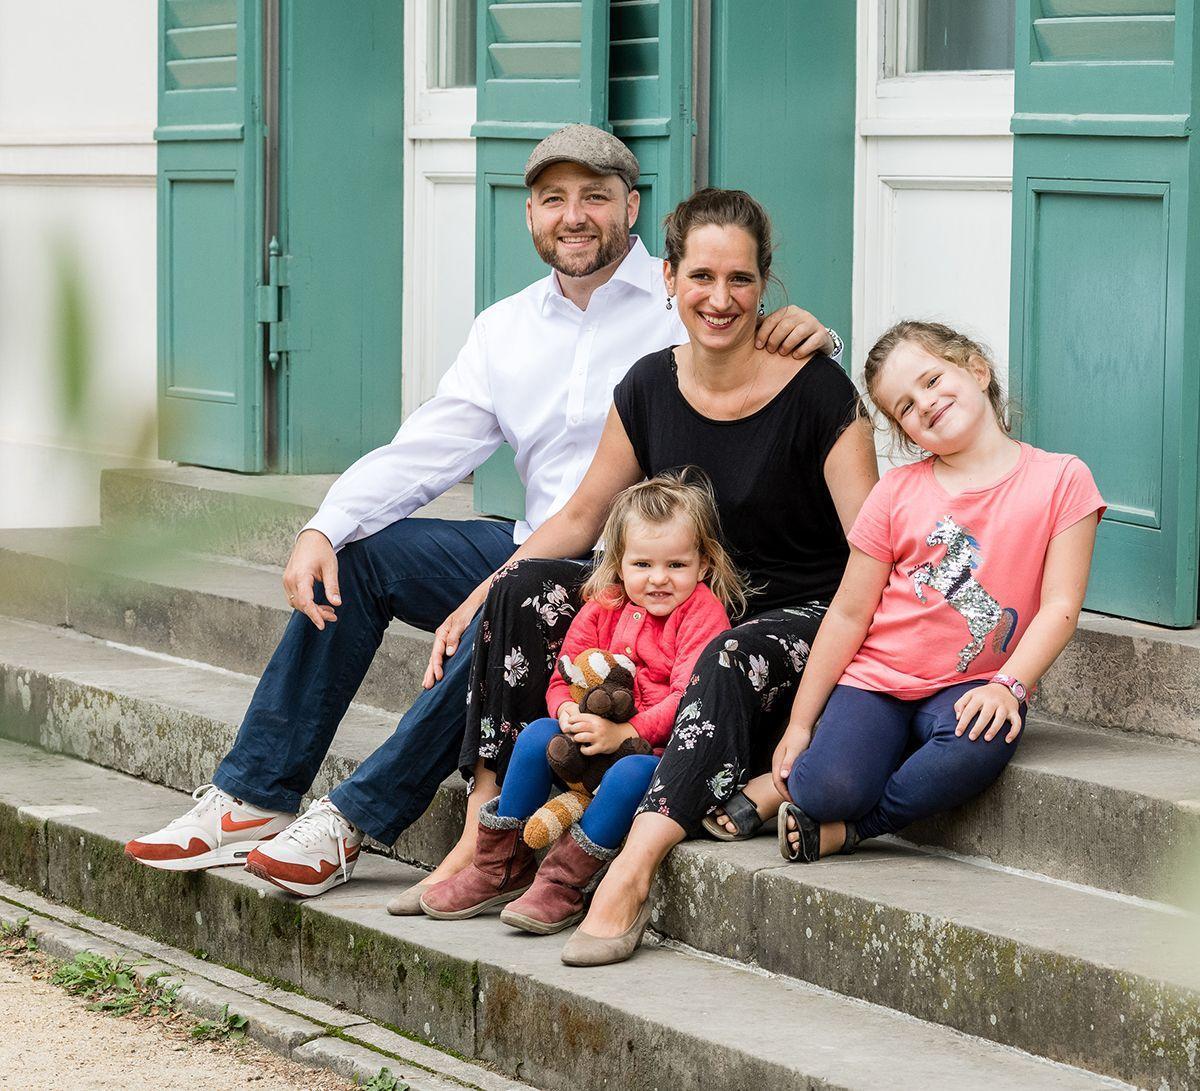 photograifc, familienfotos, familienshooting, outdoorshooting, fotograf Berlin, fotograf wilmersdorf, fotostudio charlottenbrug, vivian werk